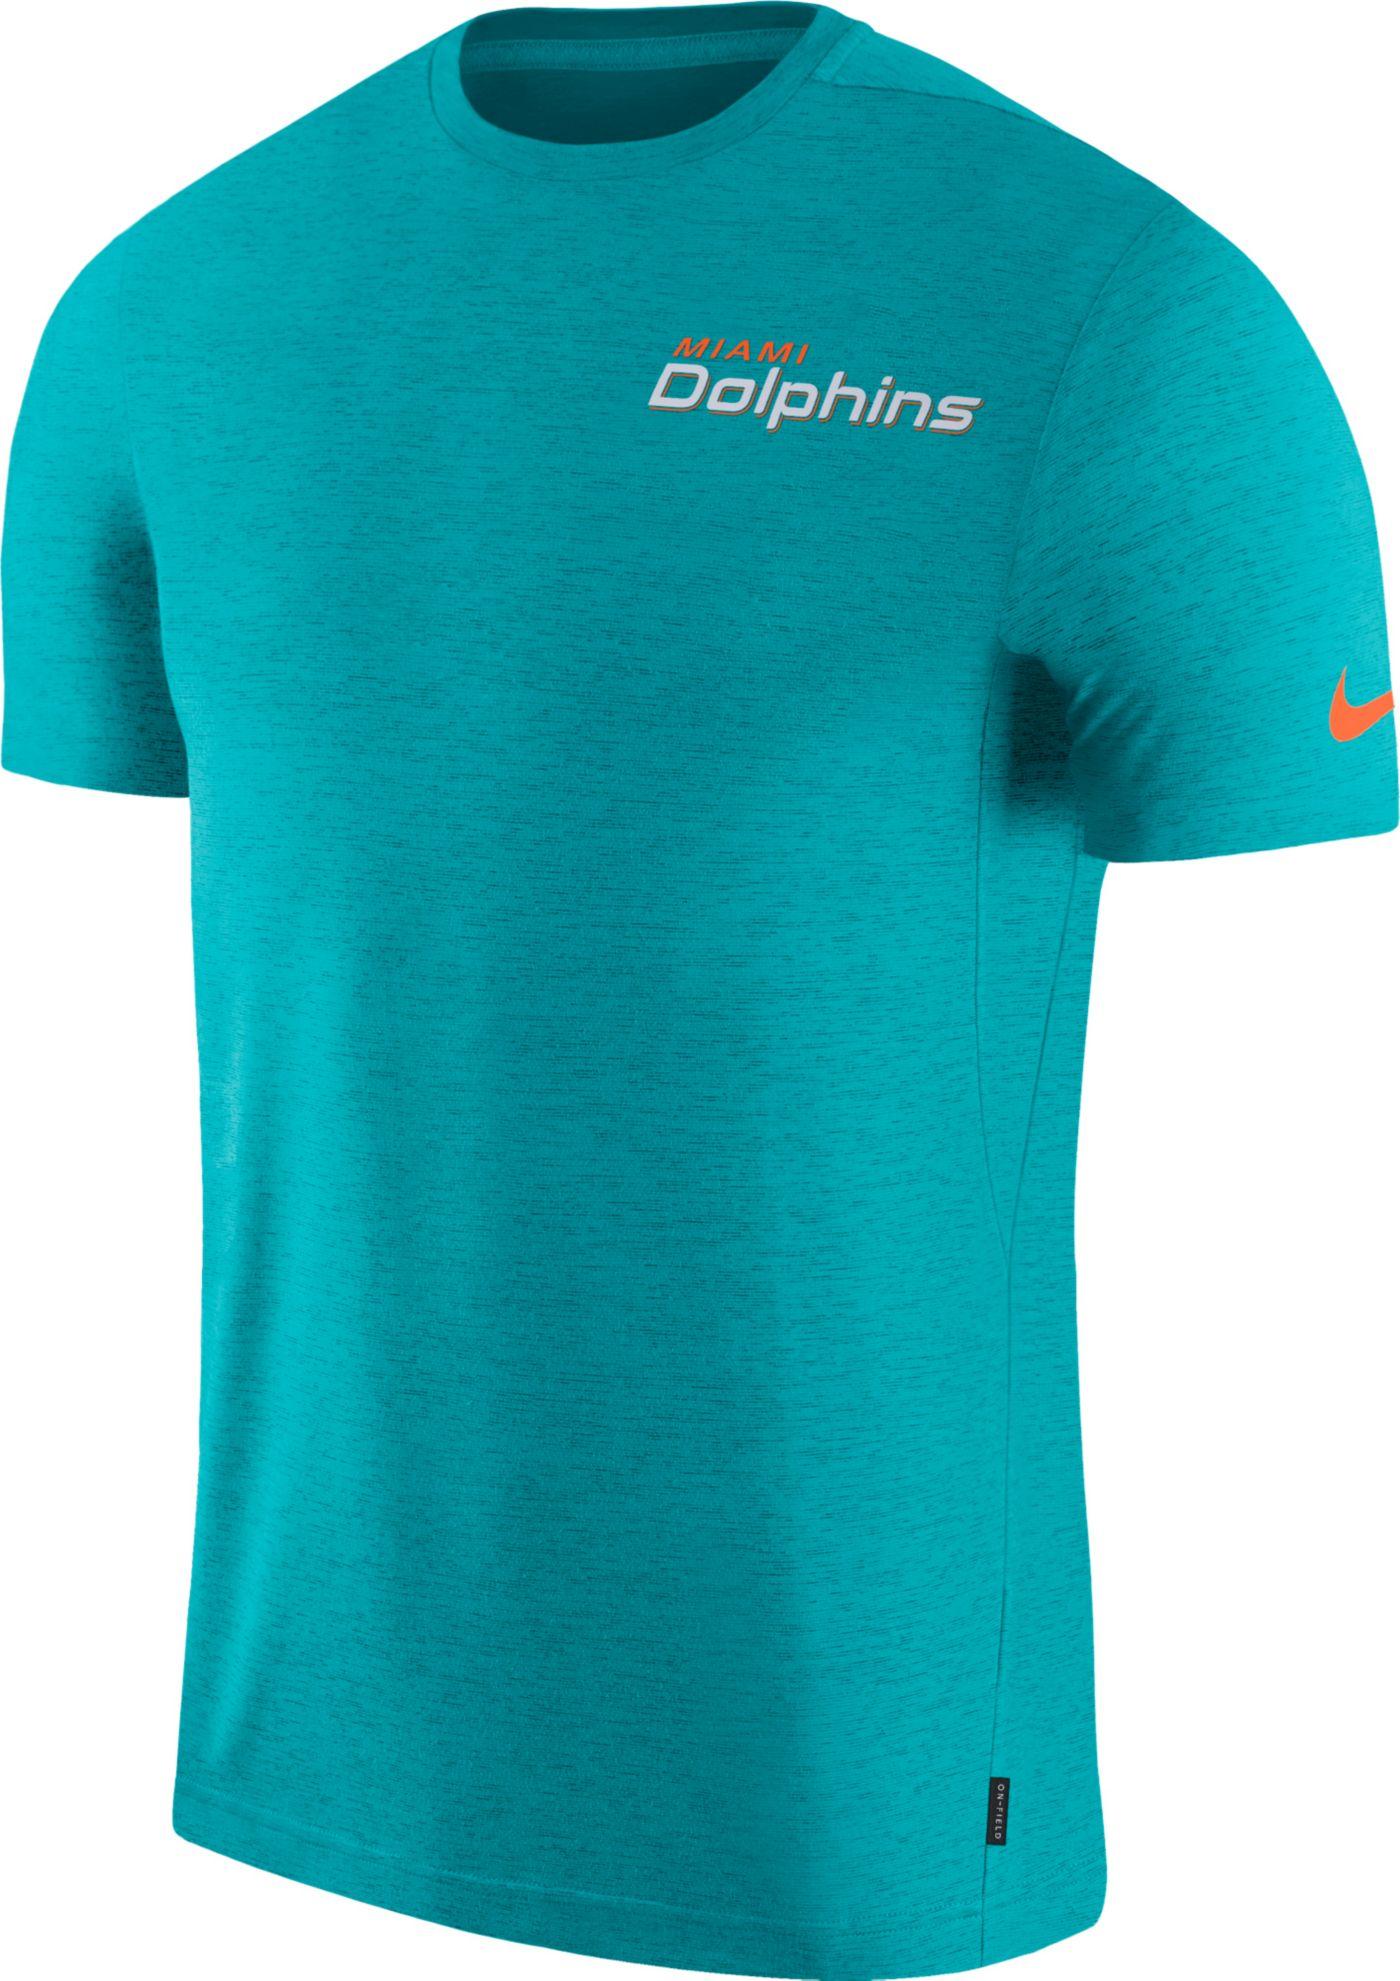 Nike Men's Miami Dolphins Sideline Coach Performance Aqua T-Shirt